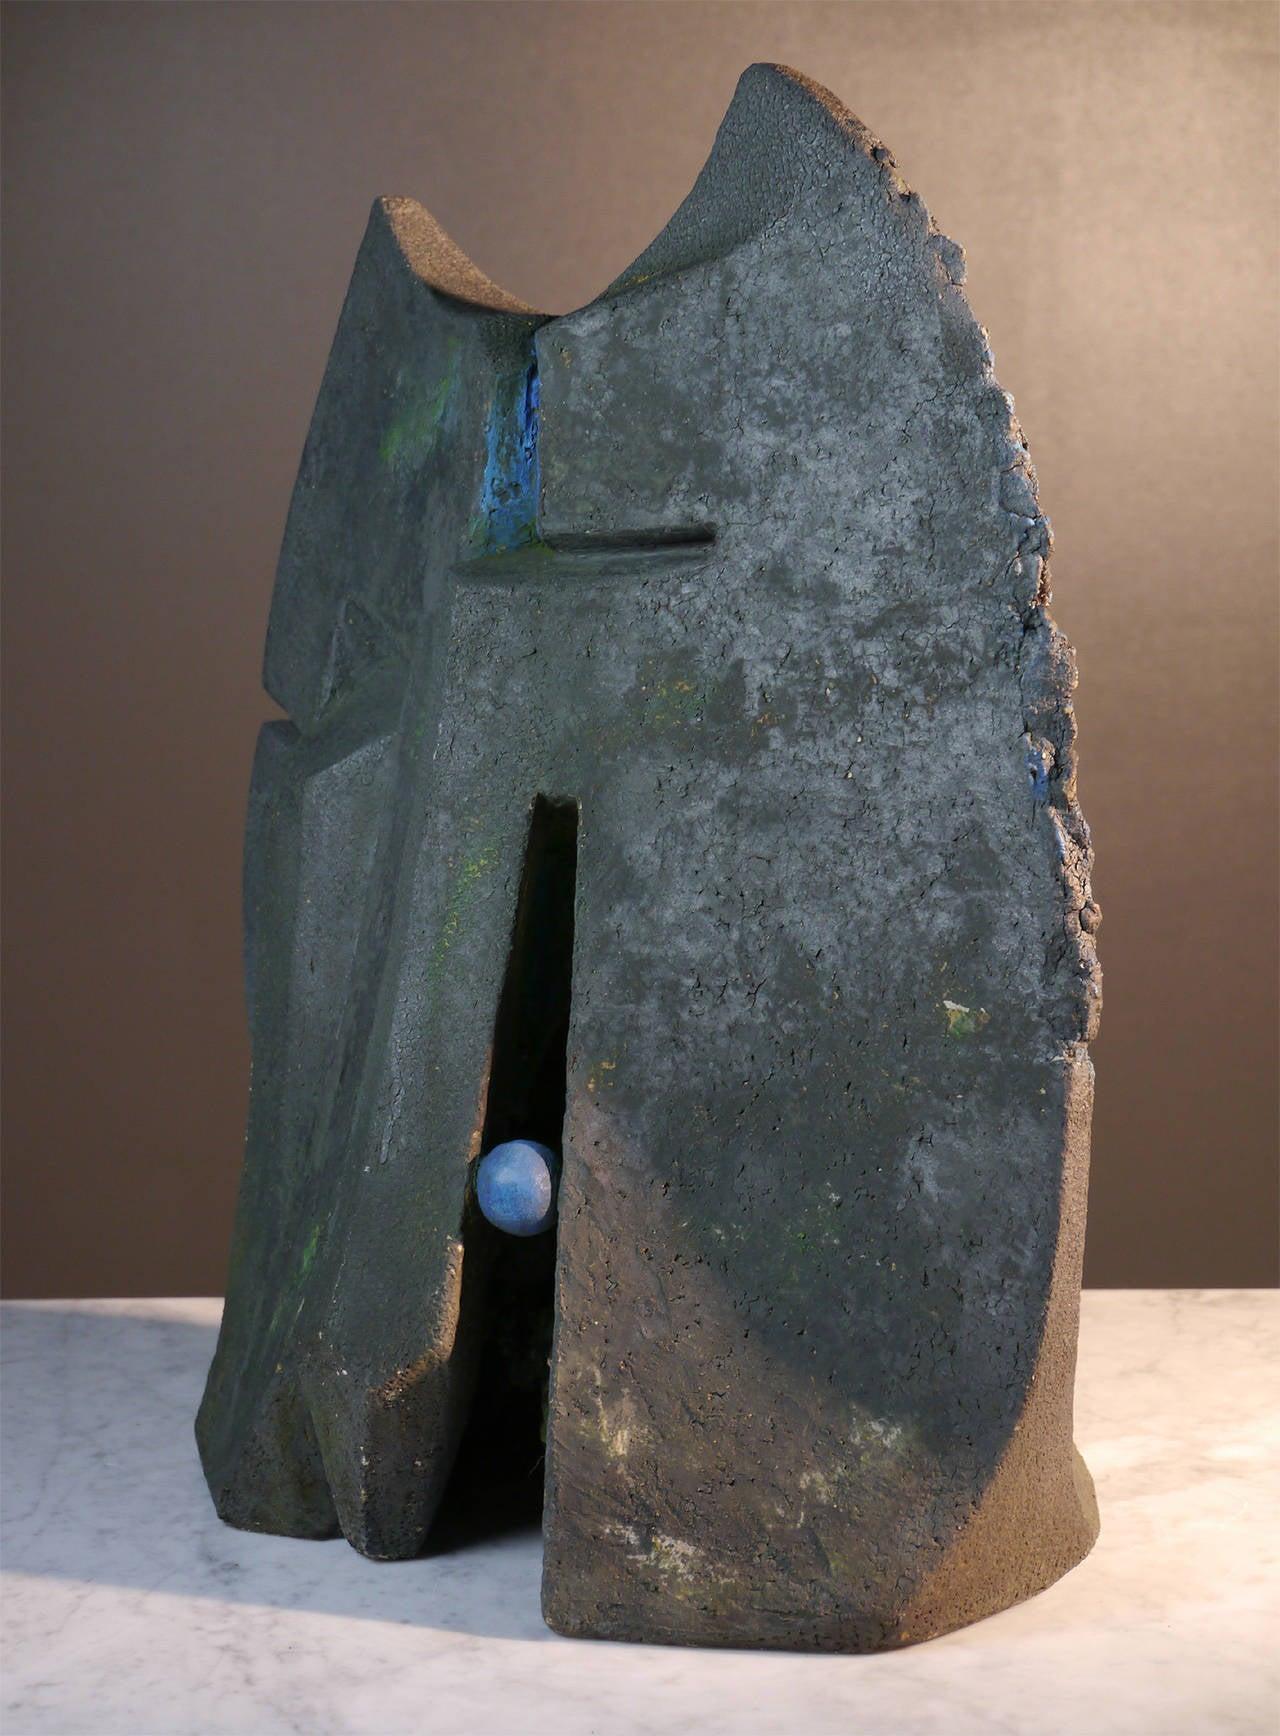 Stoneware Sculpture by Josette Barbier, 1990 6